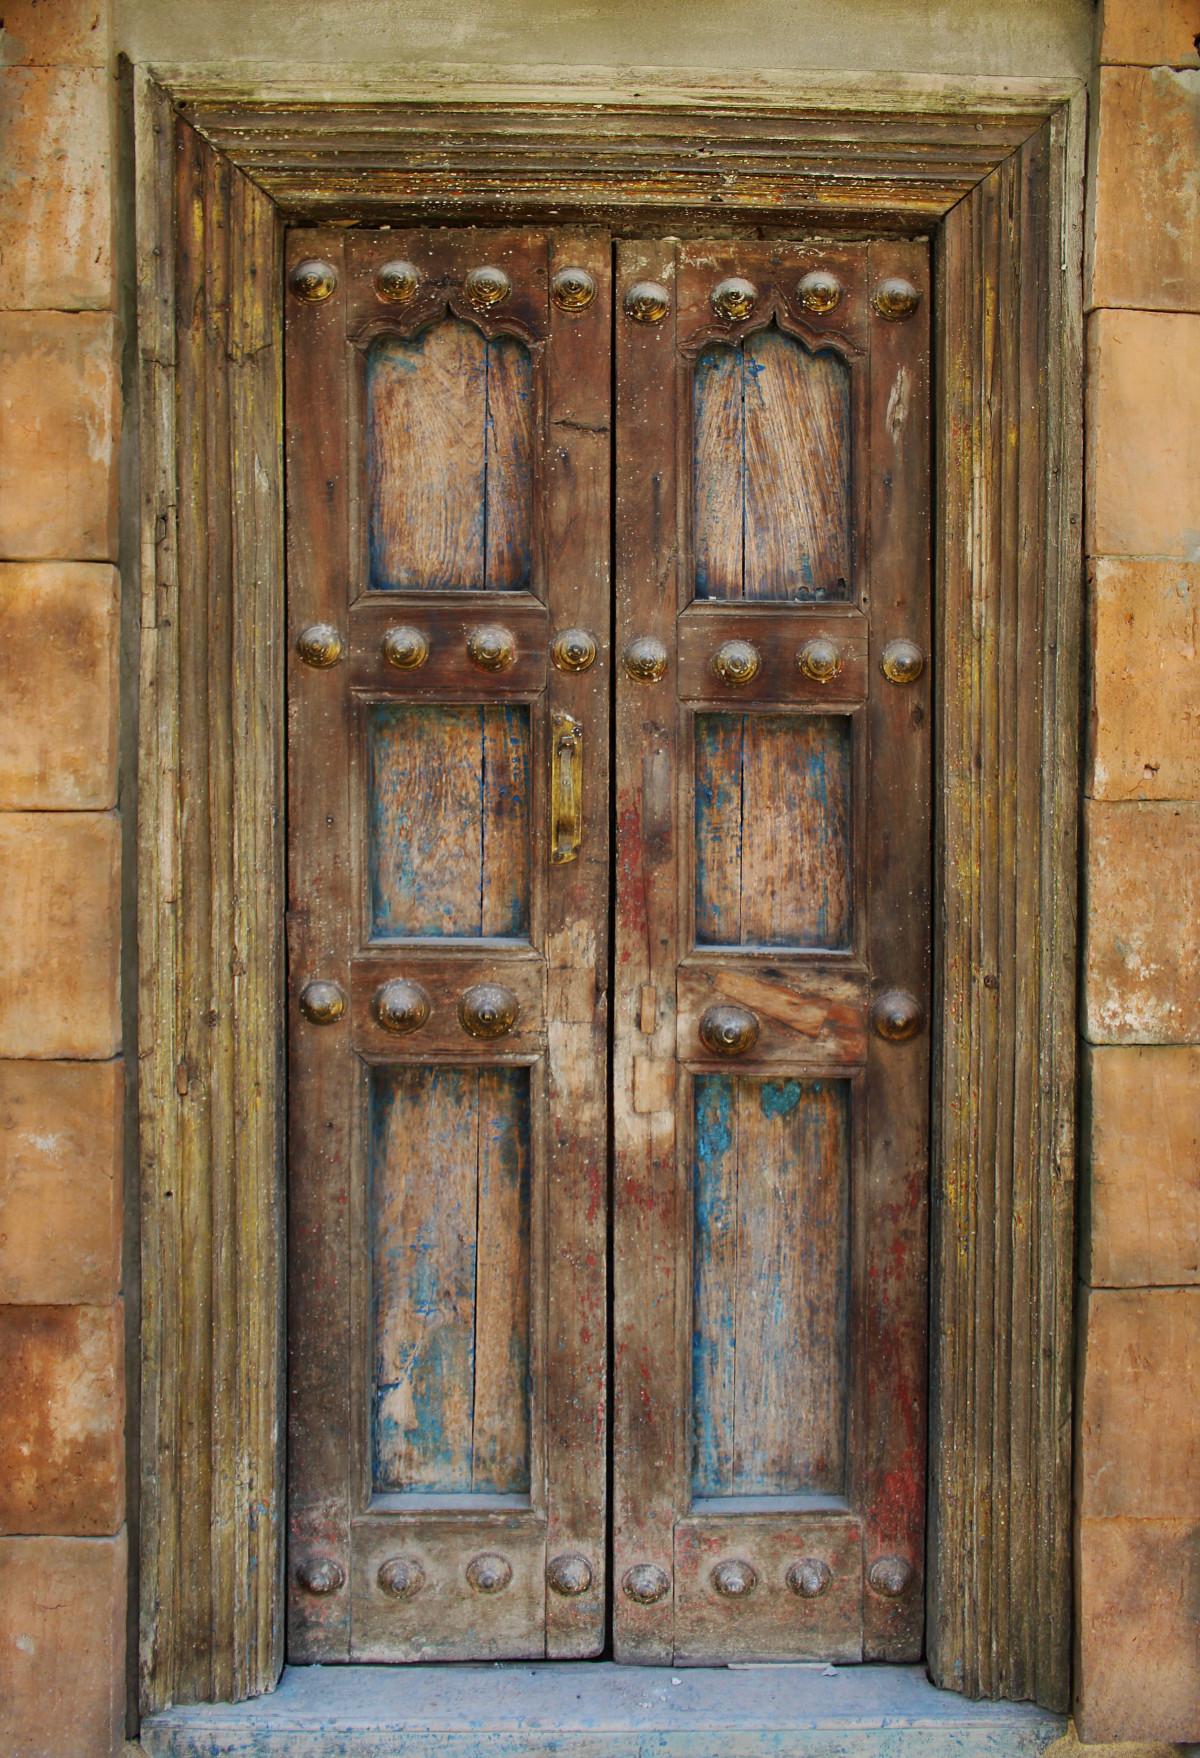 Free Images Closed Entrance Doorway Interior Design